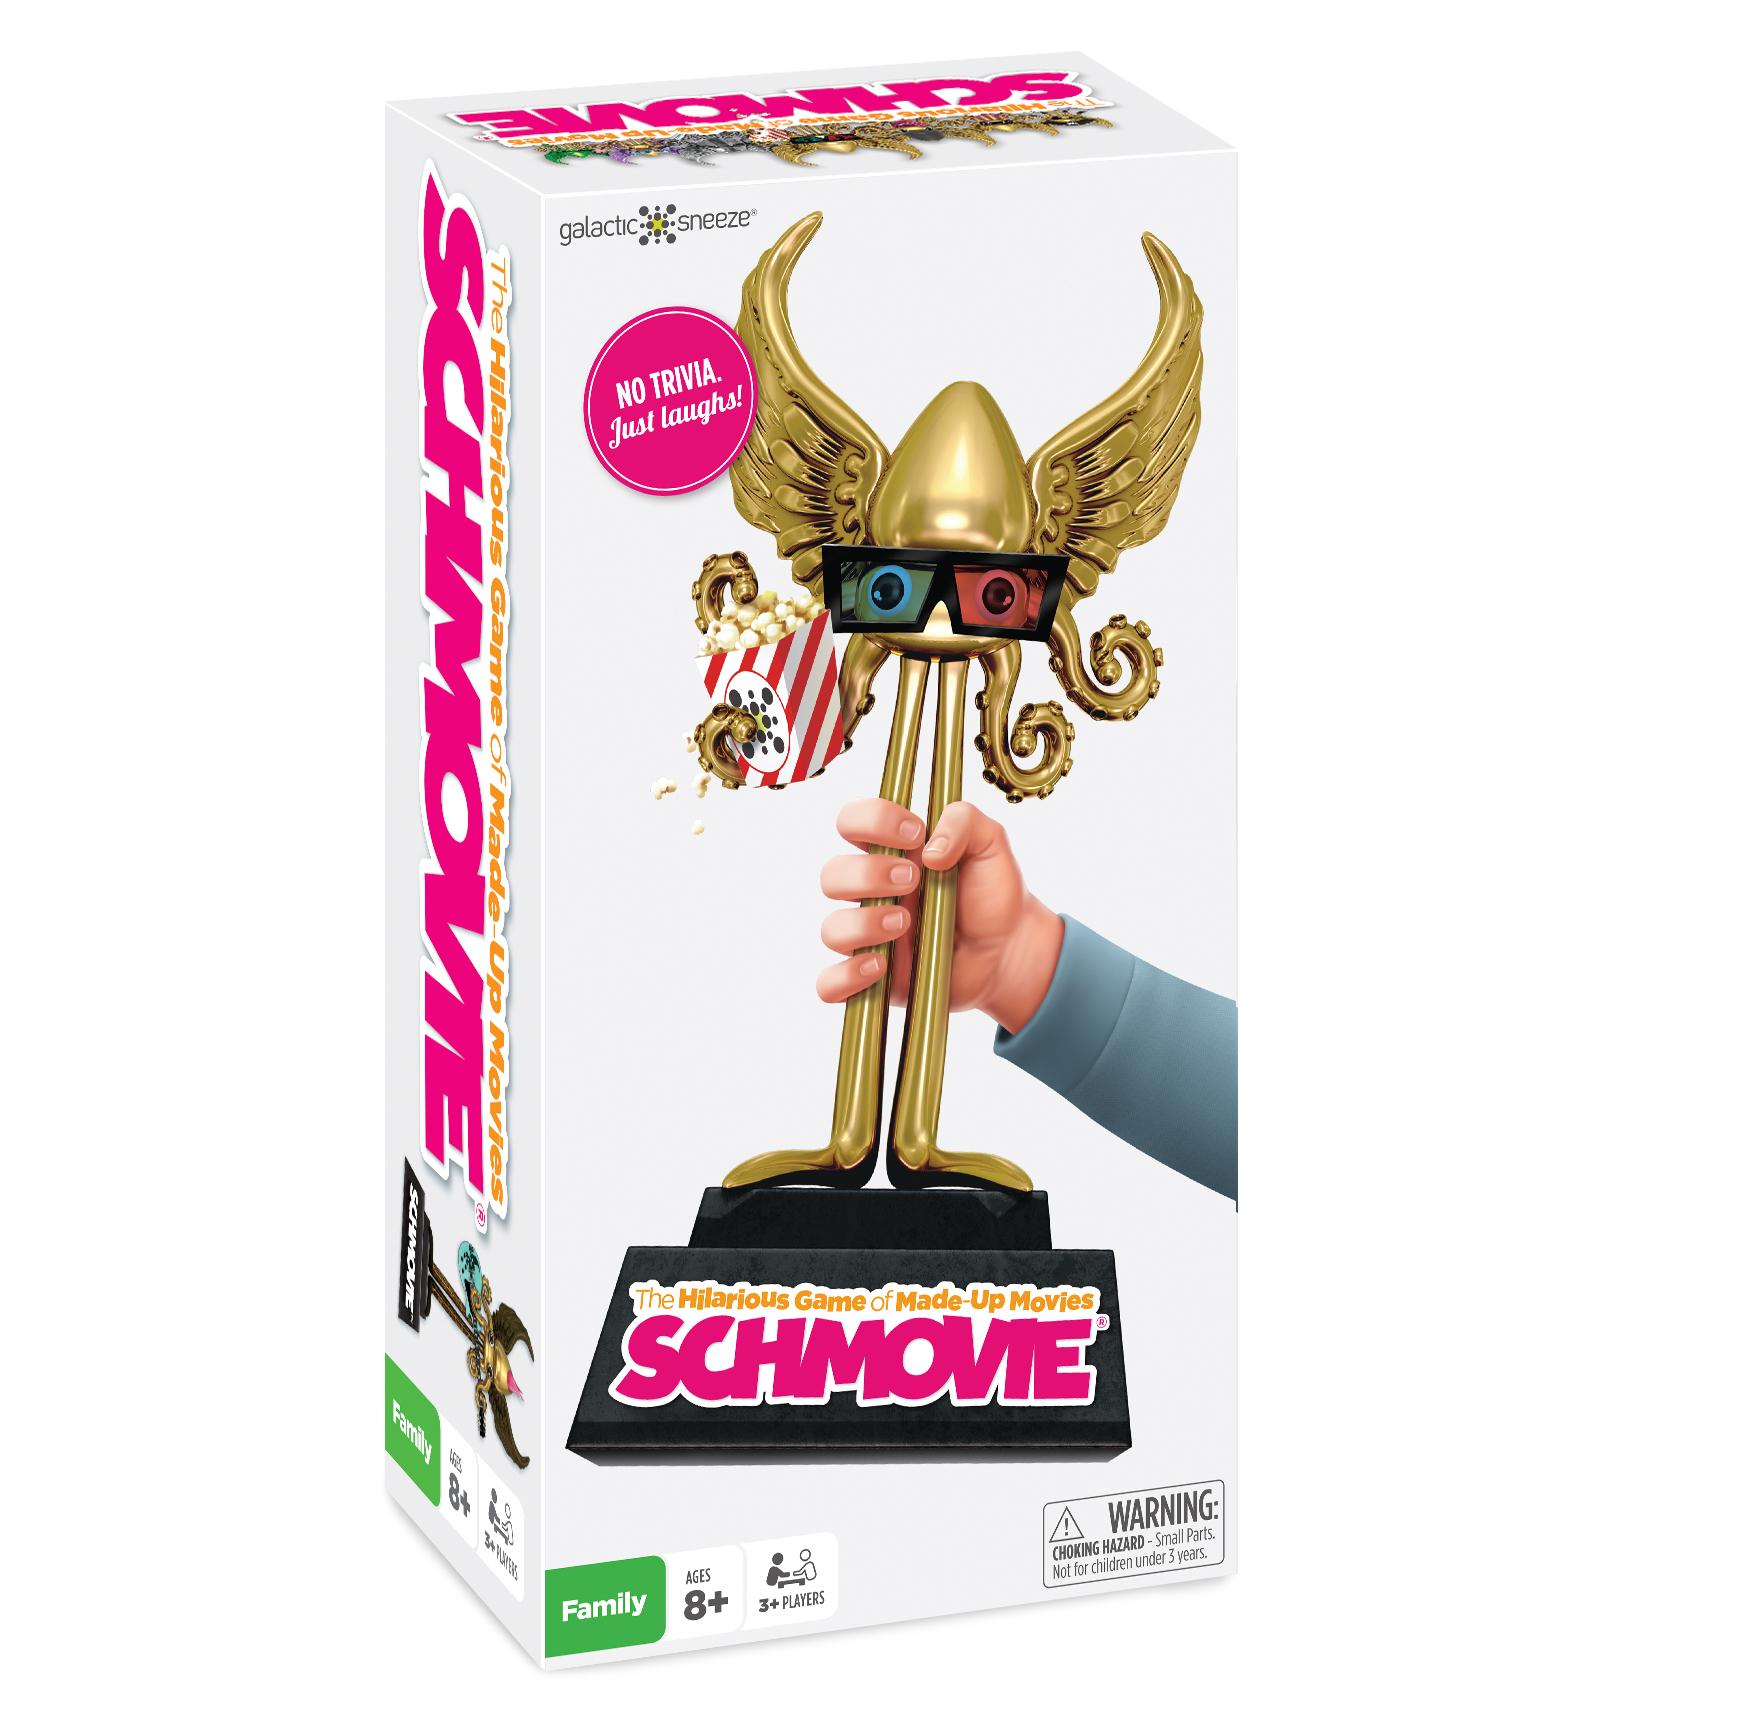 schmoviebu 001